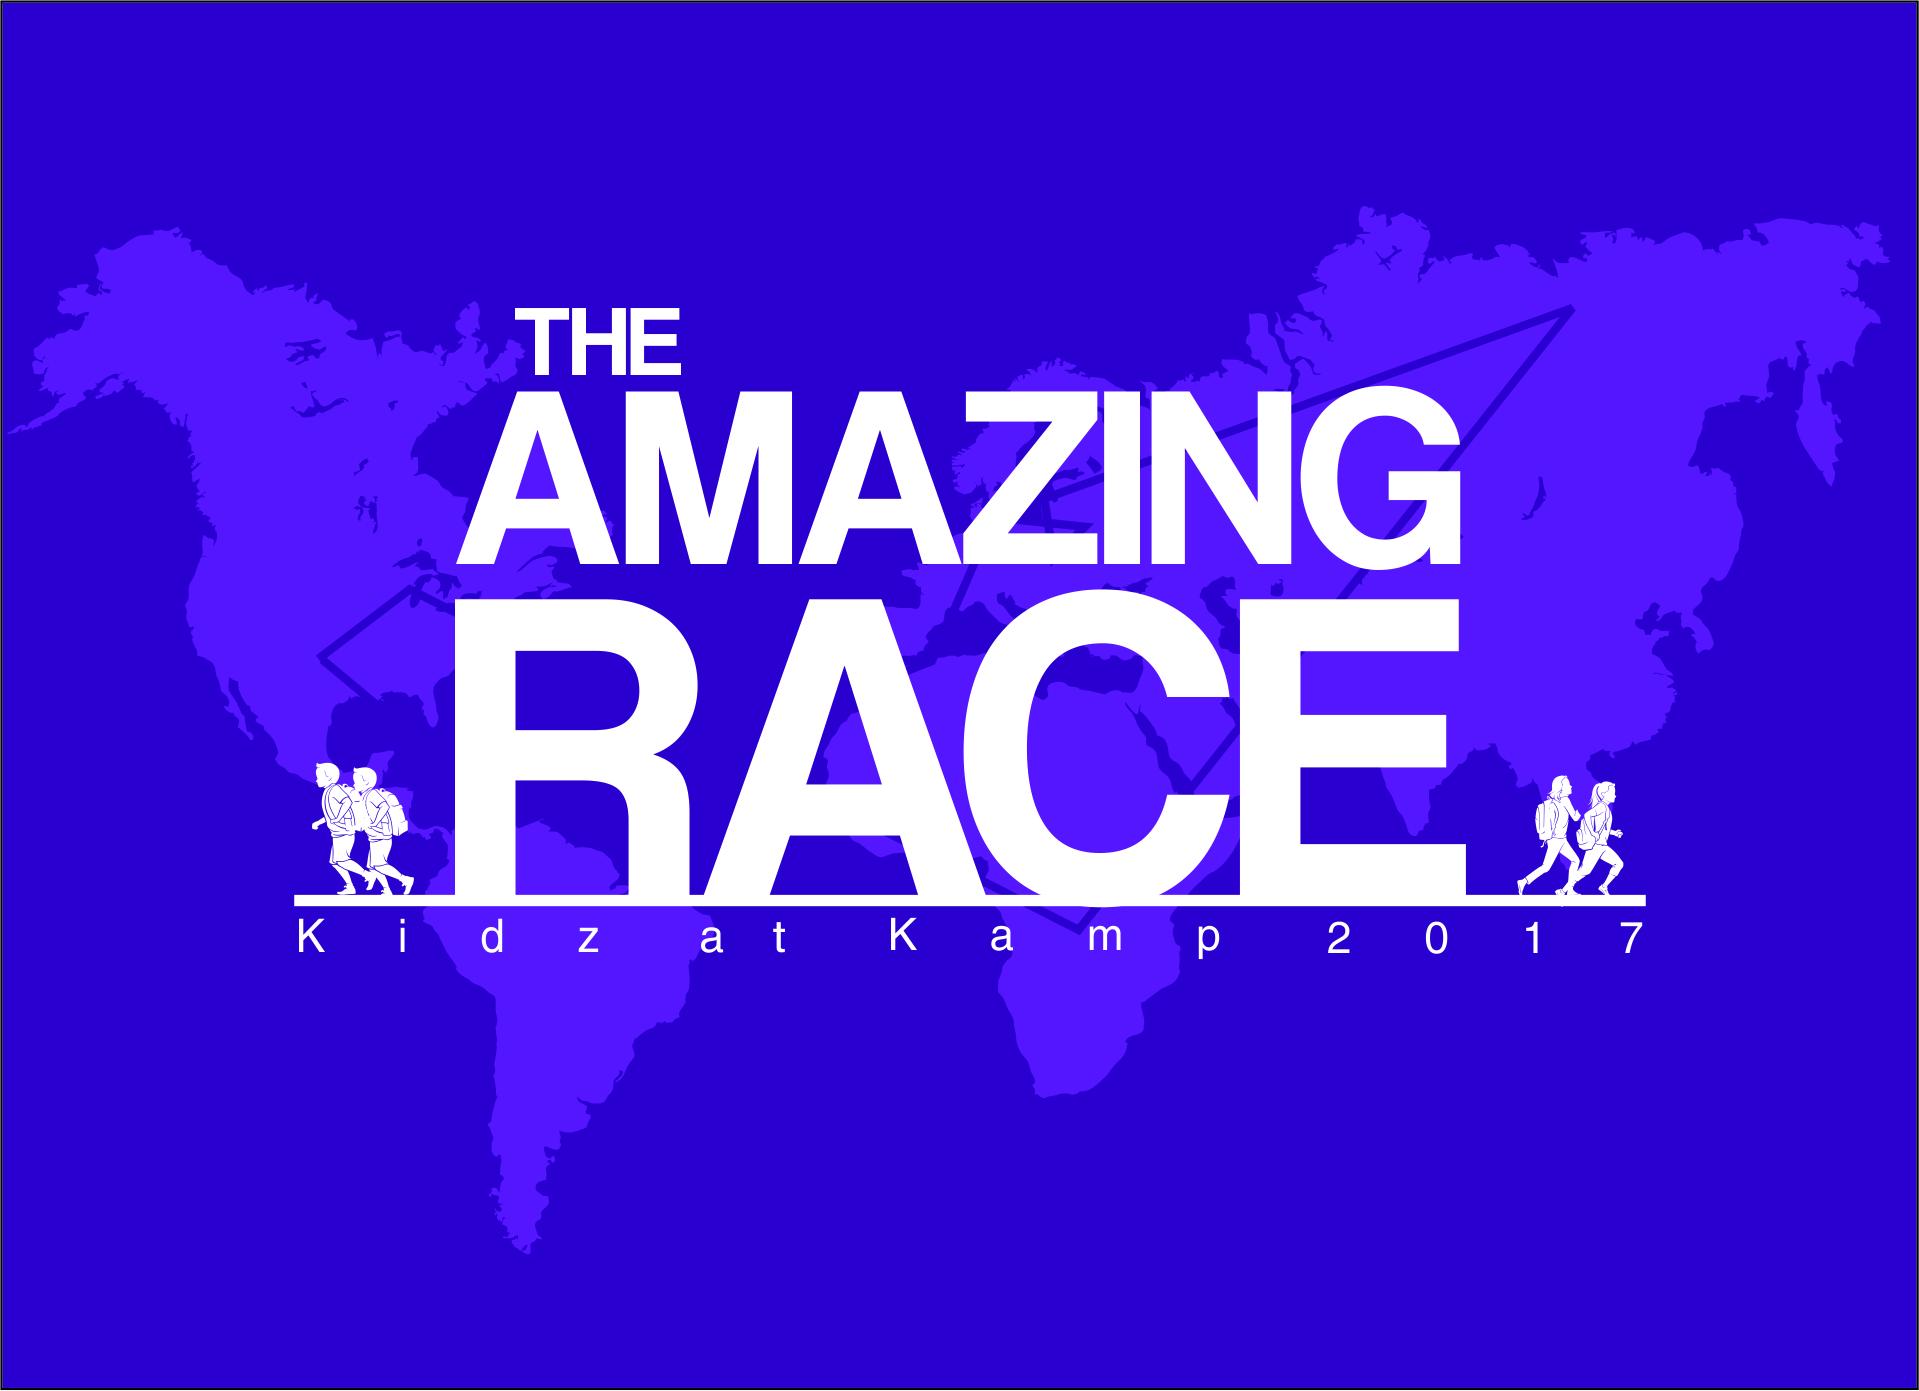 Amazing race logo full color